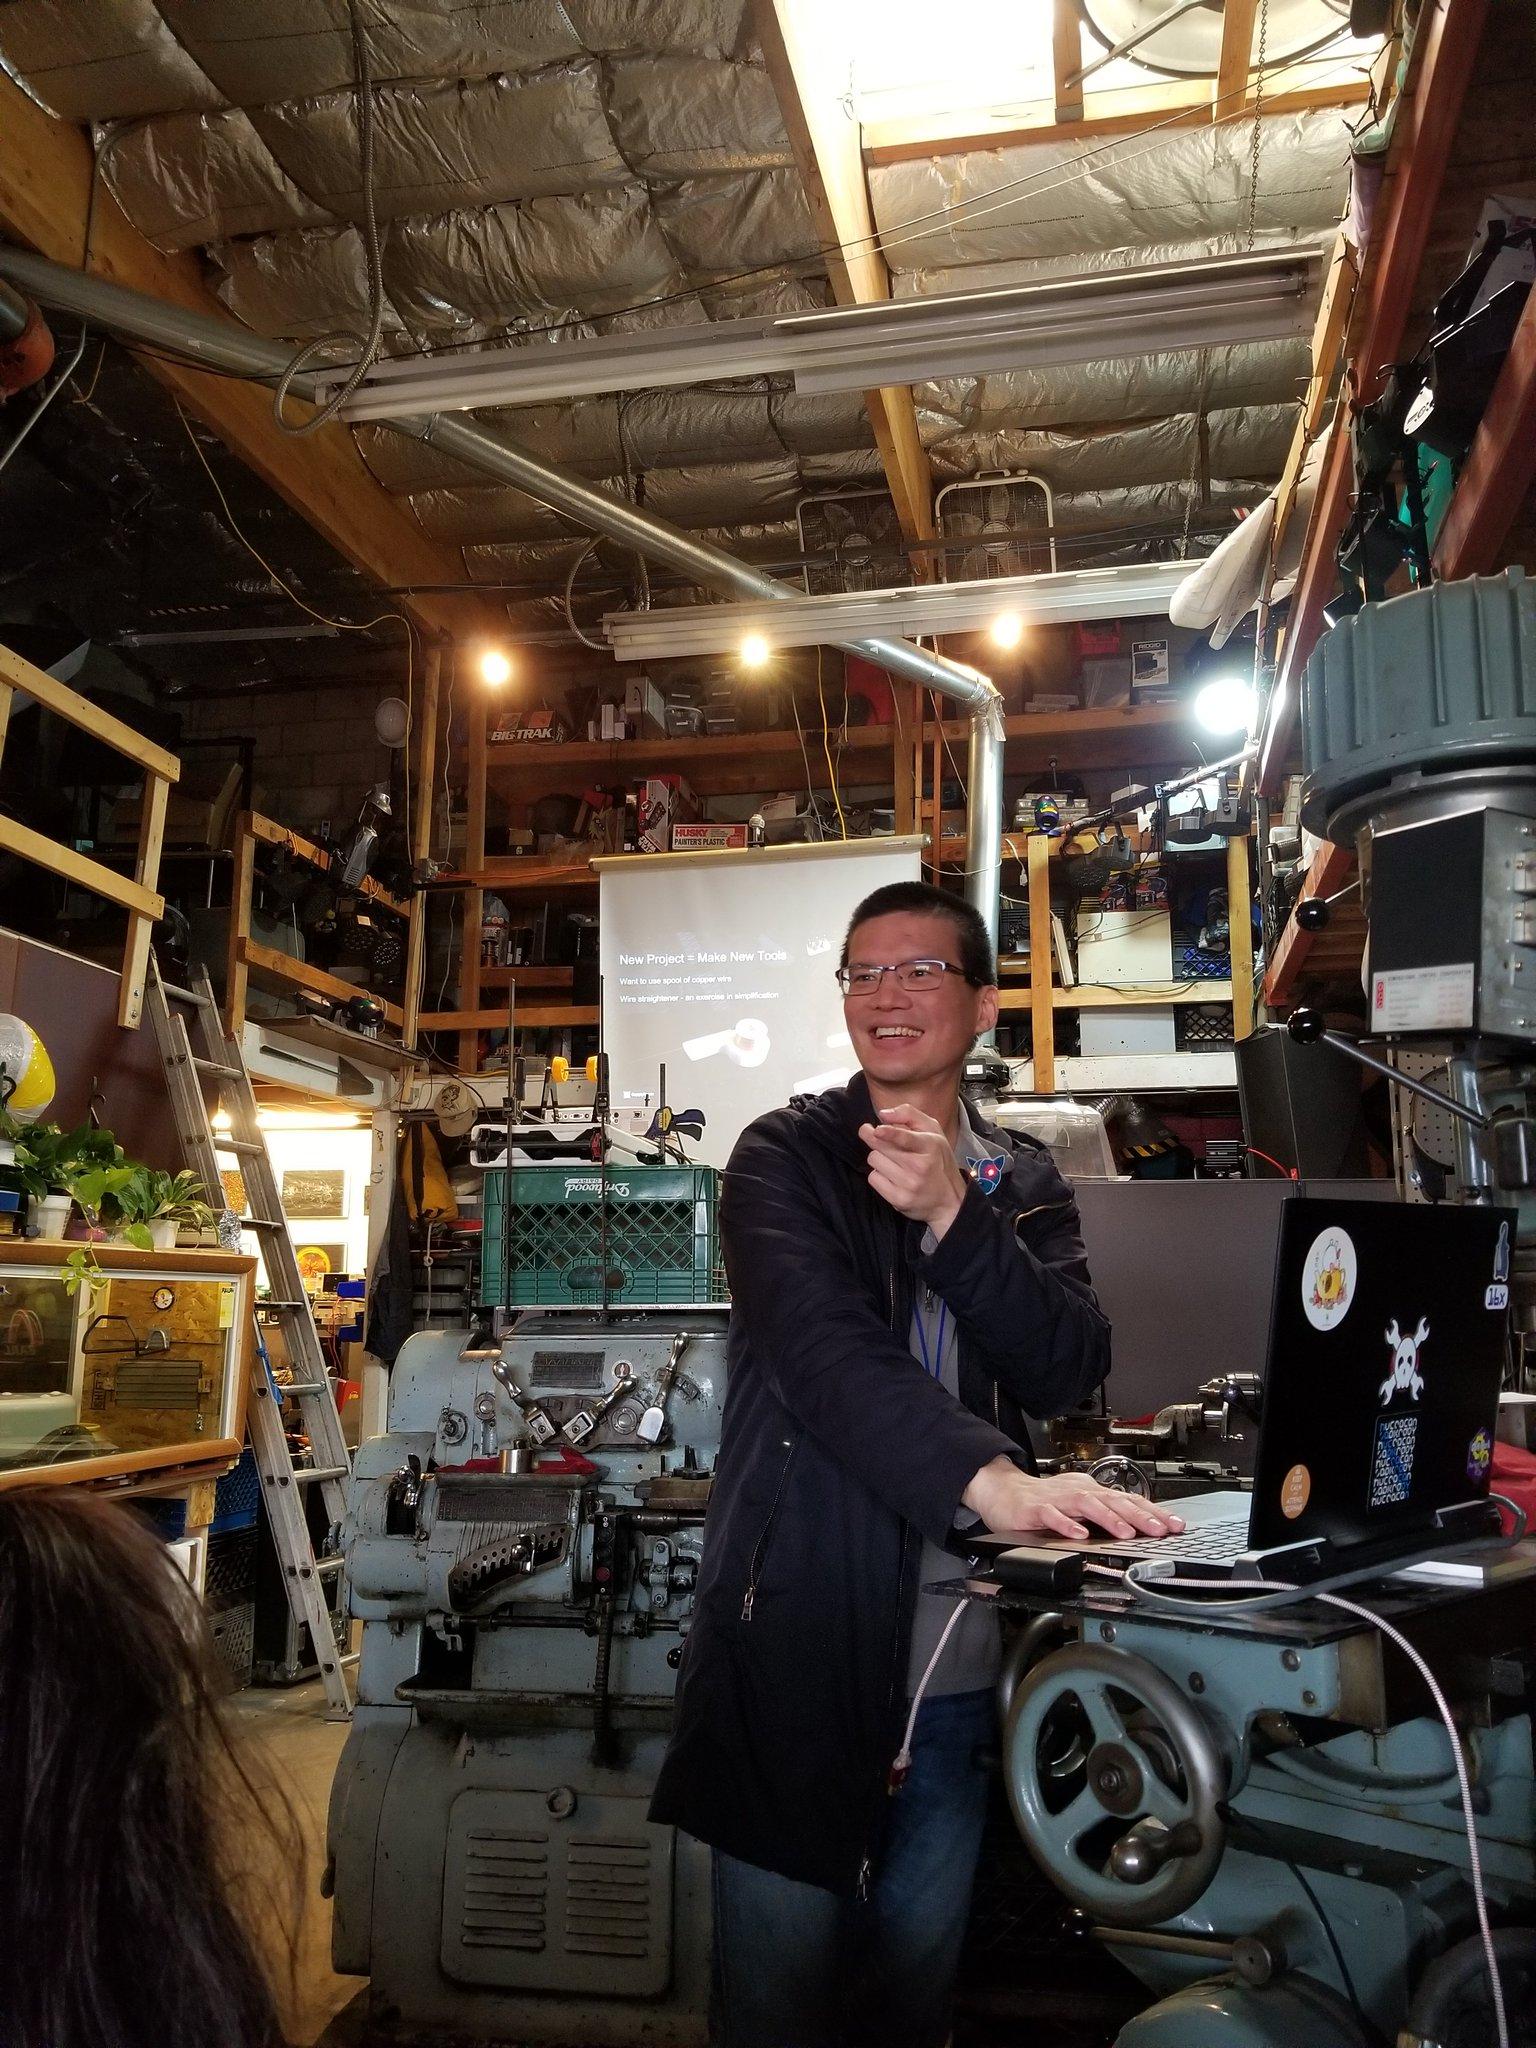 Roger presenting at Sparklecon